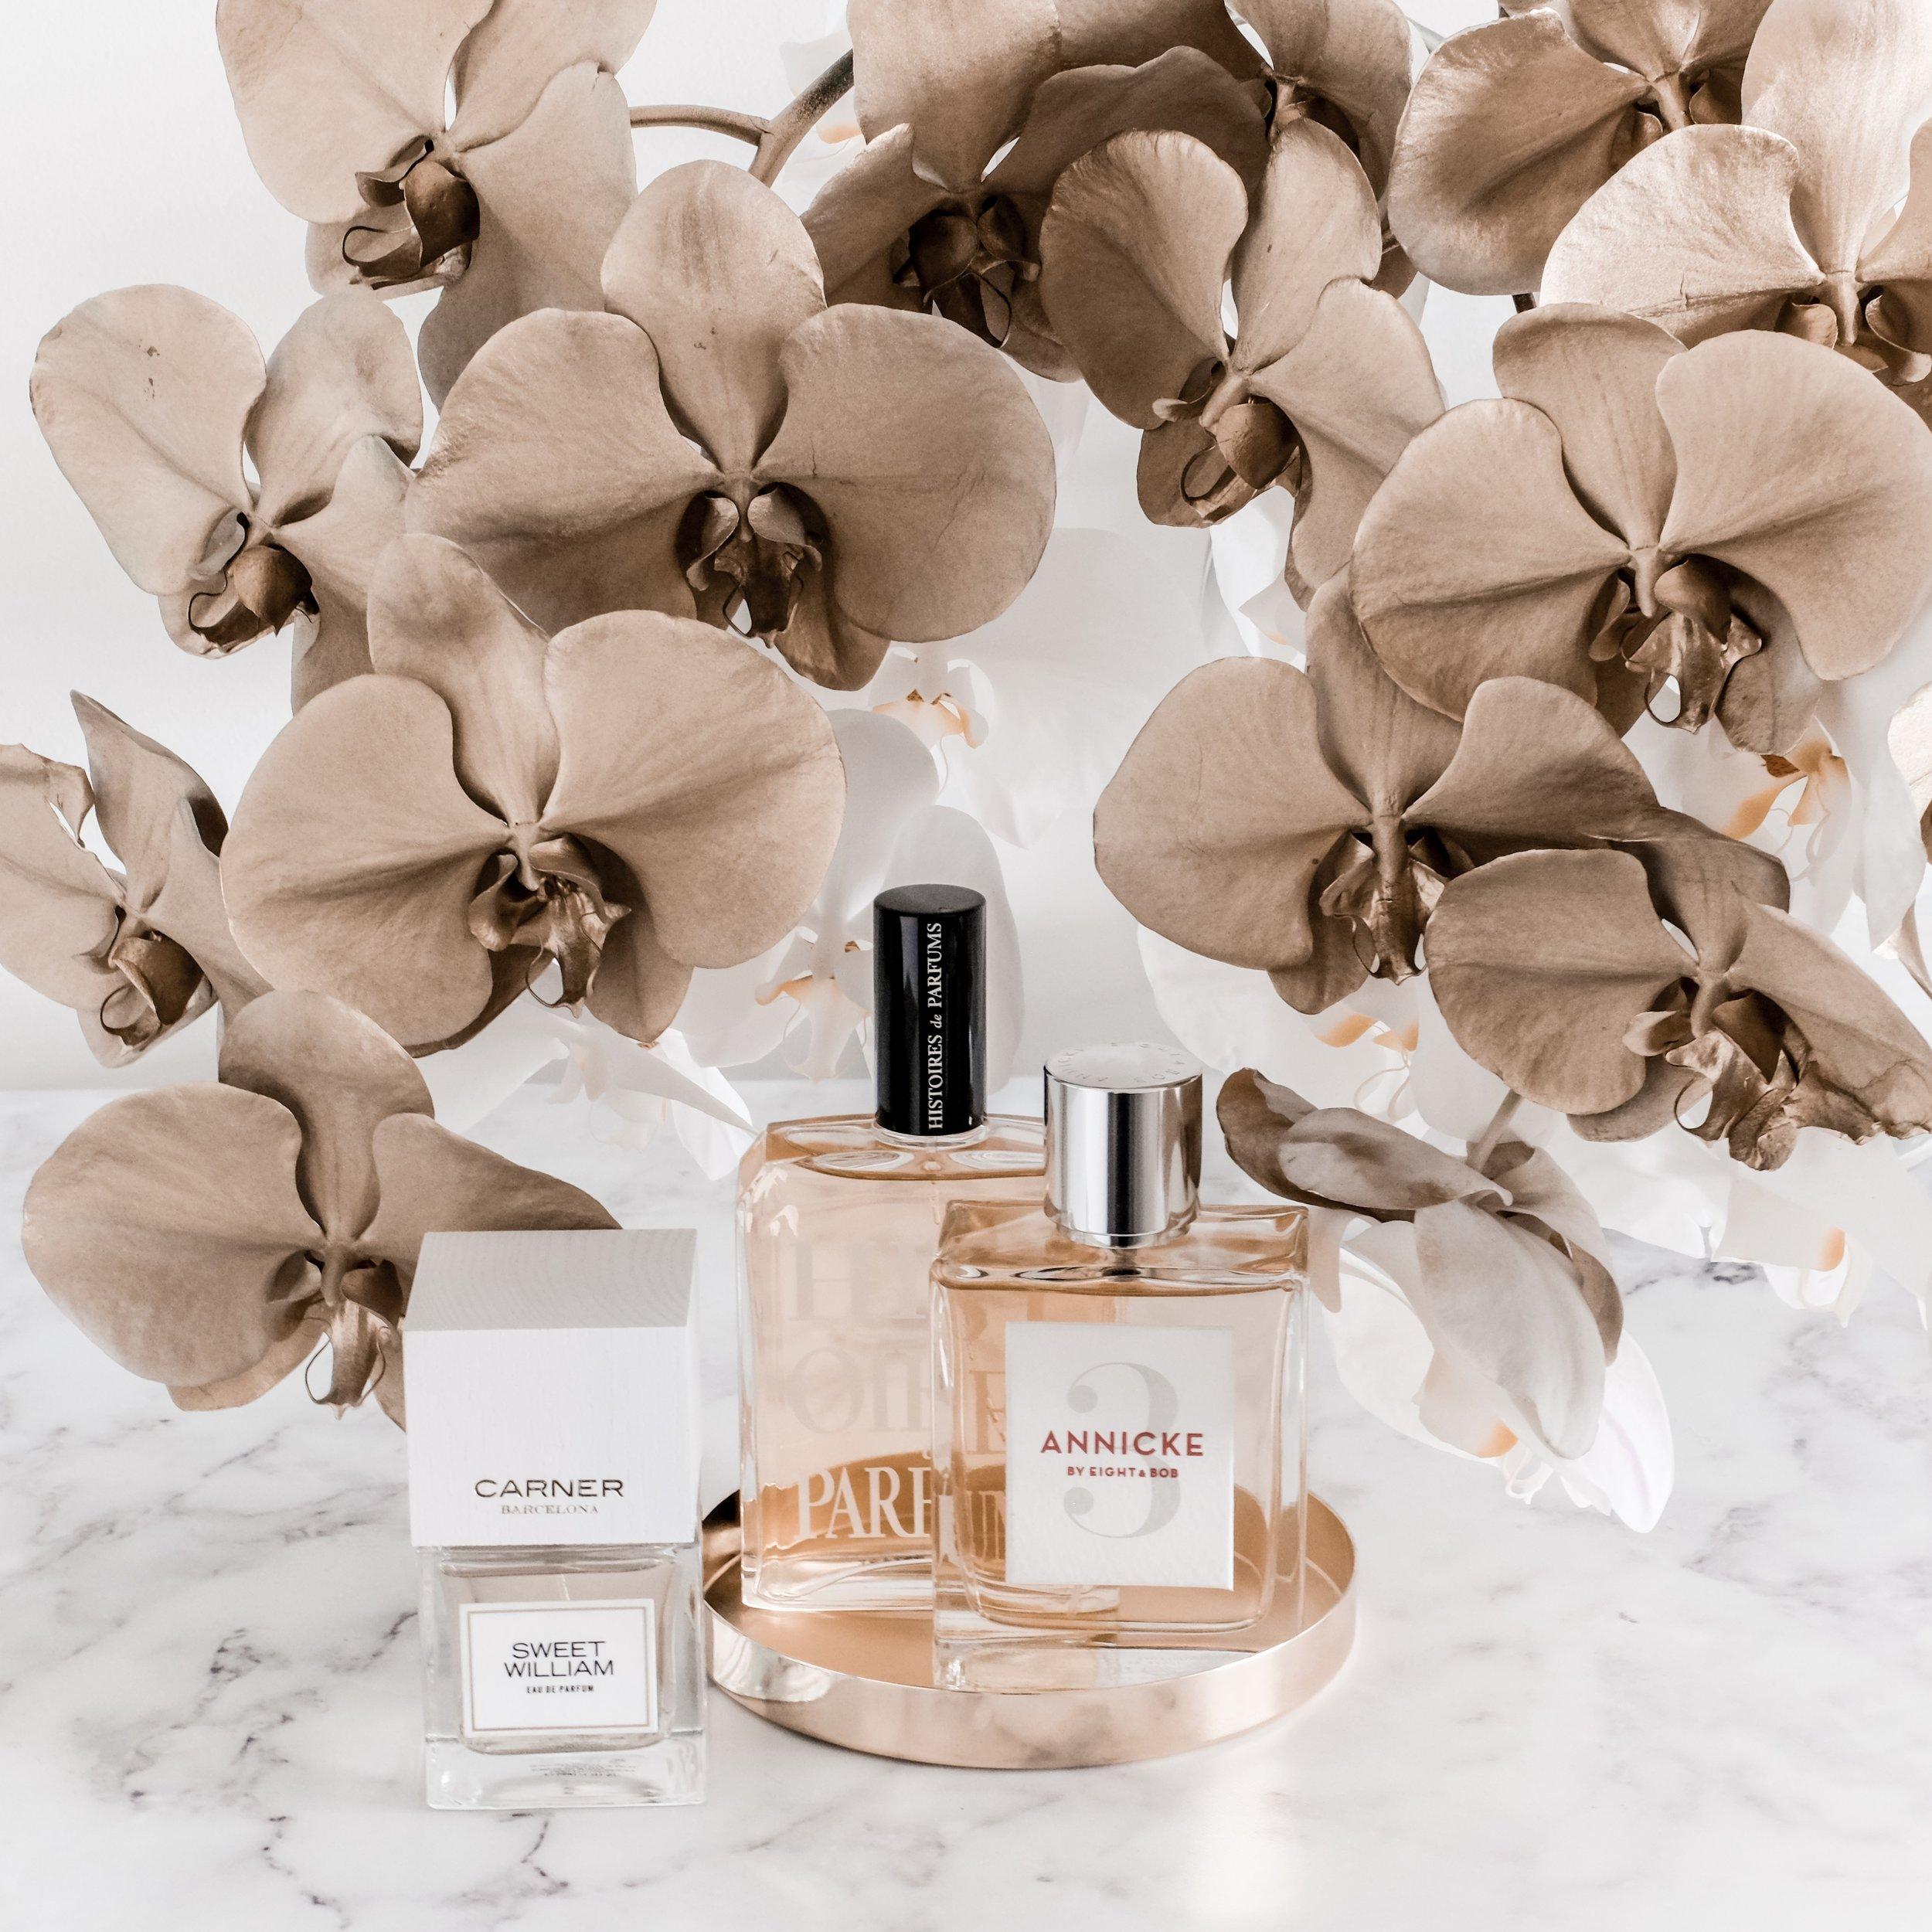 My Fragrance Trio from Lore Perfumery